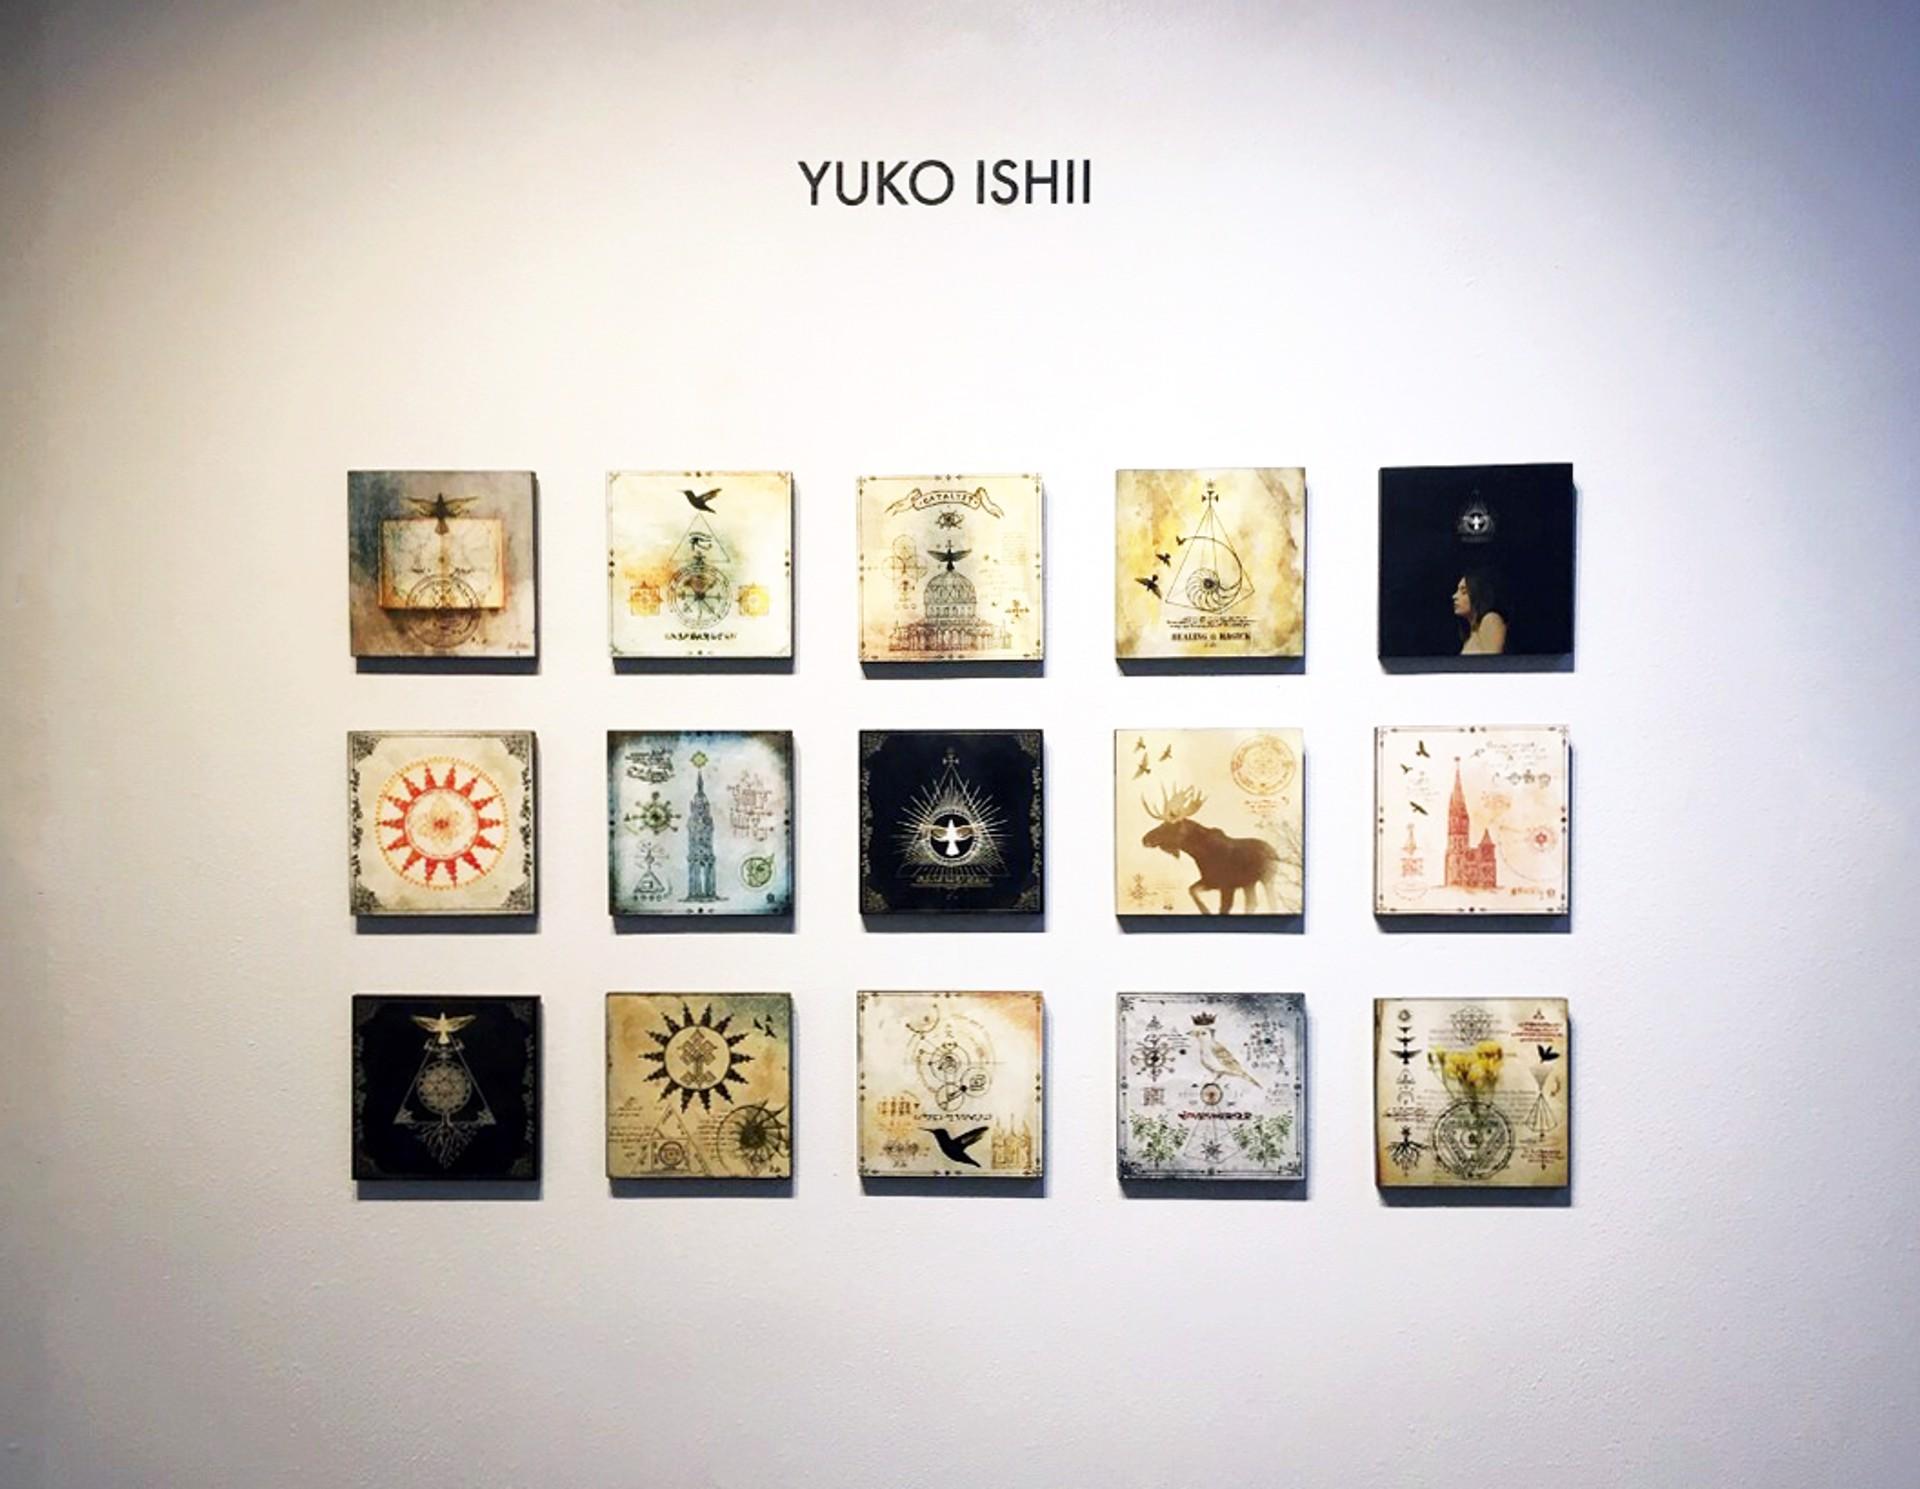 Soulbird (everlastingly yours) by Yuko Ishii